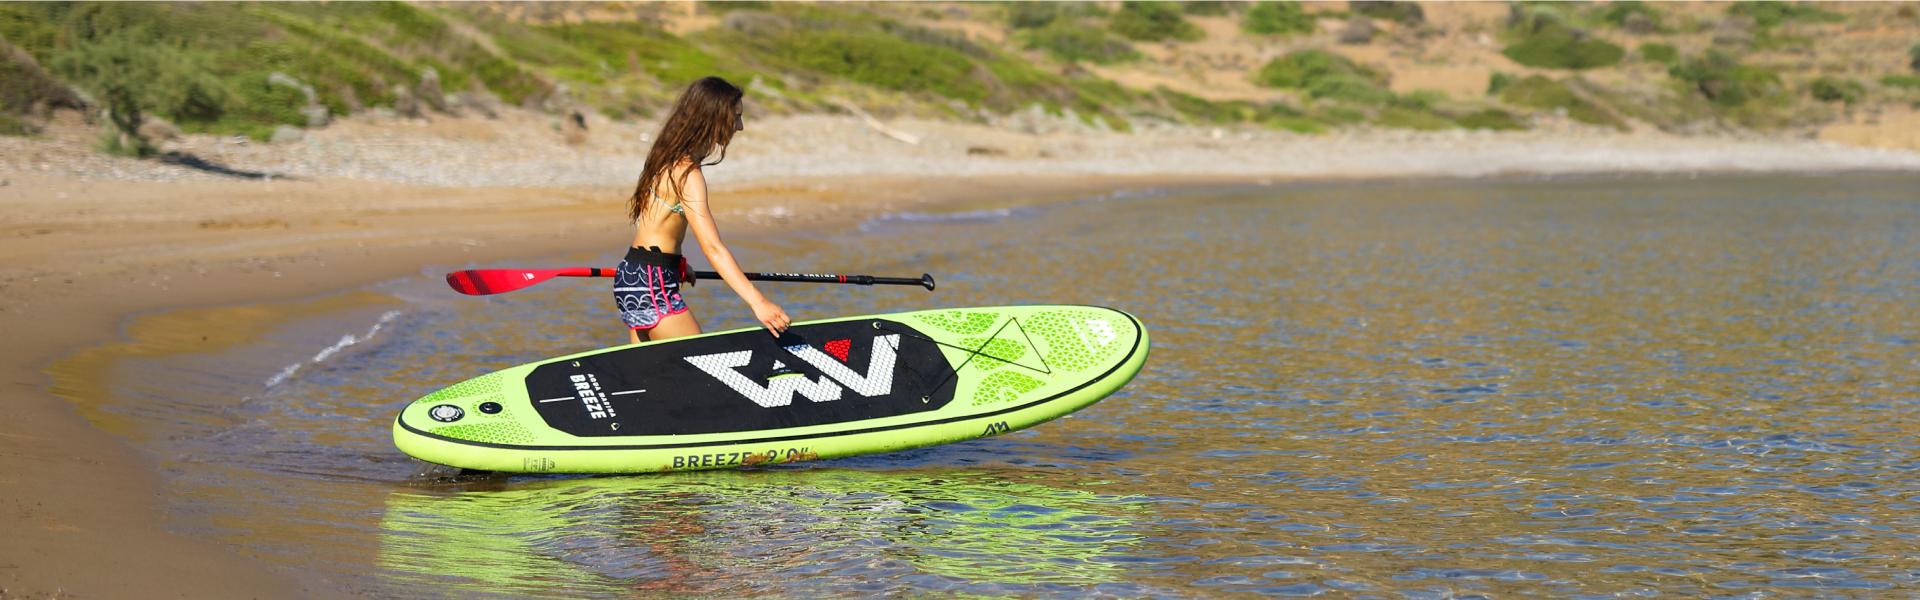 Breeze Aqua Marina 2019 SUP Paddle Board